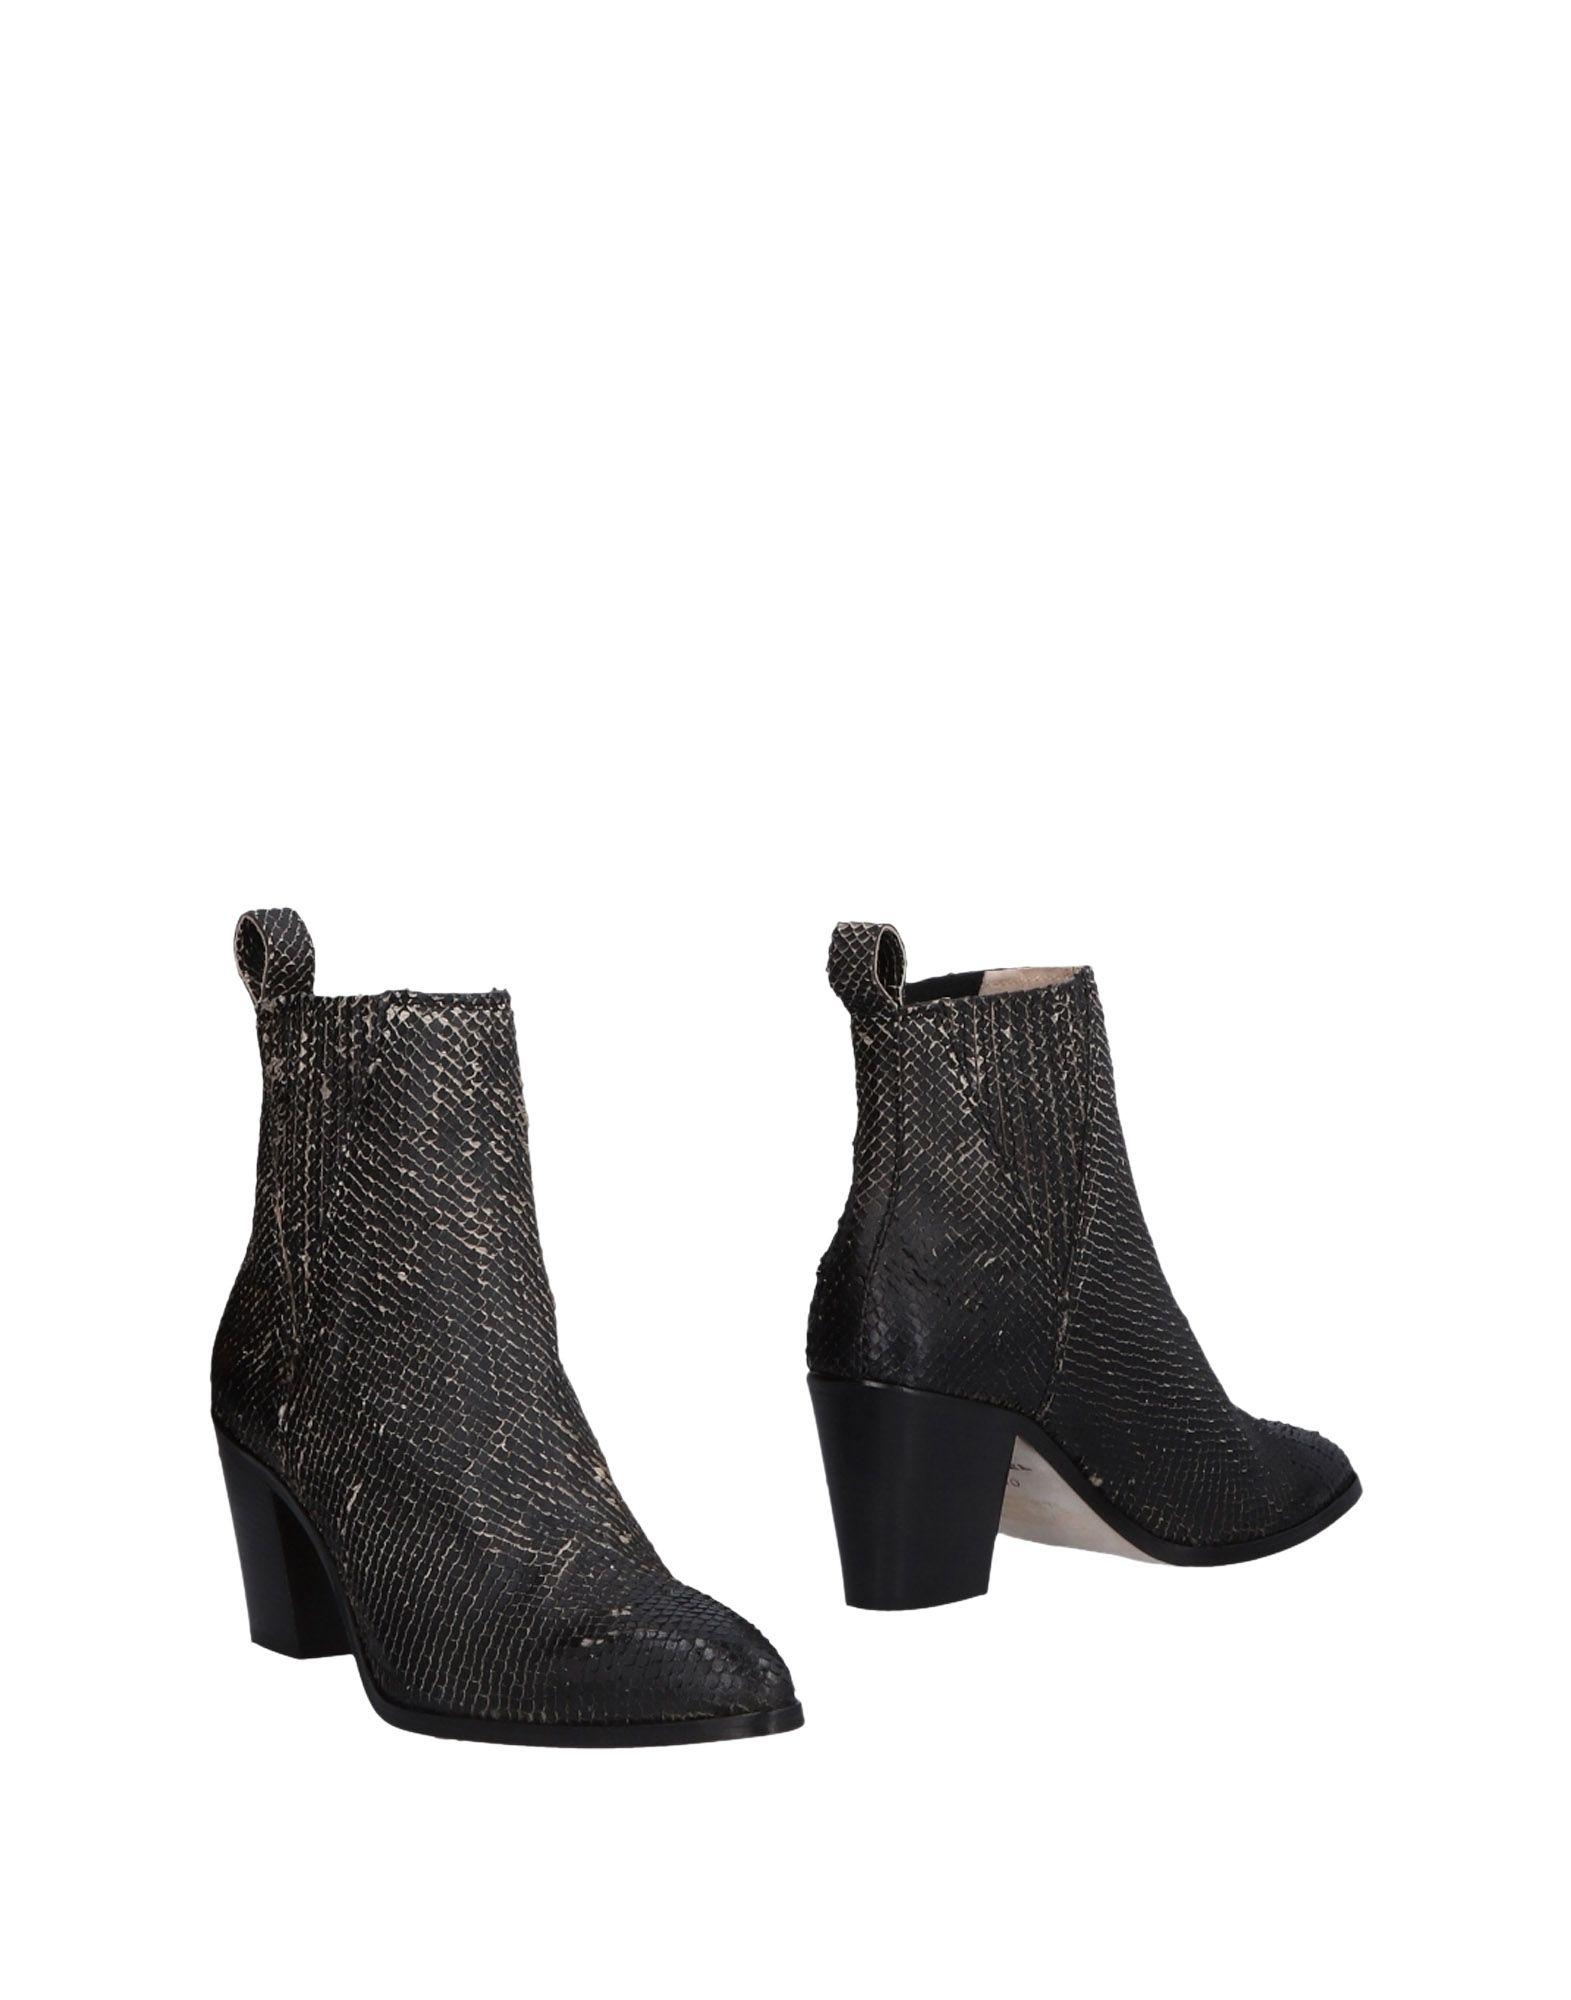 Diesel Chelsea Boots Schuhe Damen  11476563VV Neue Schuhe Boots 2594c4